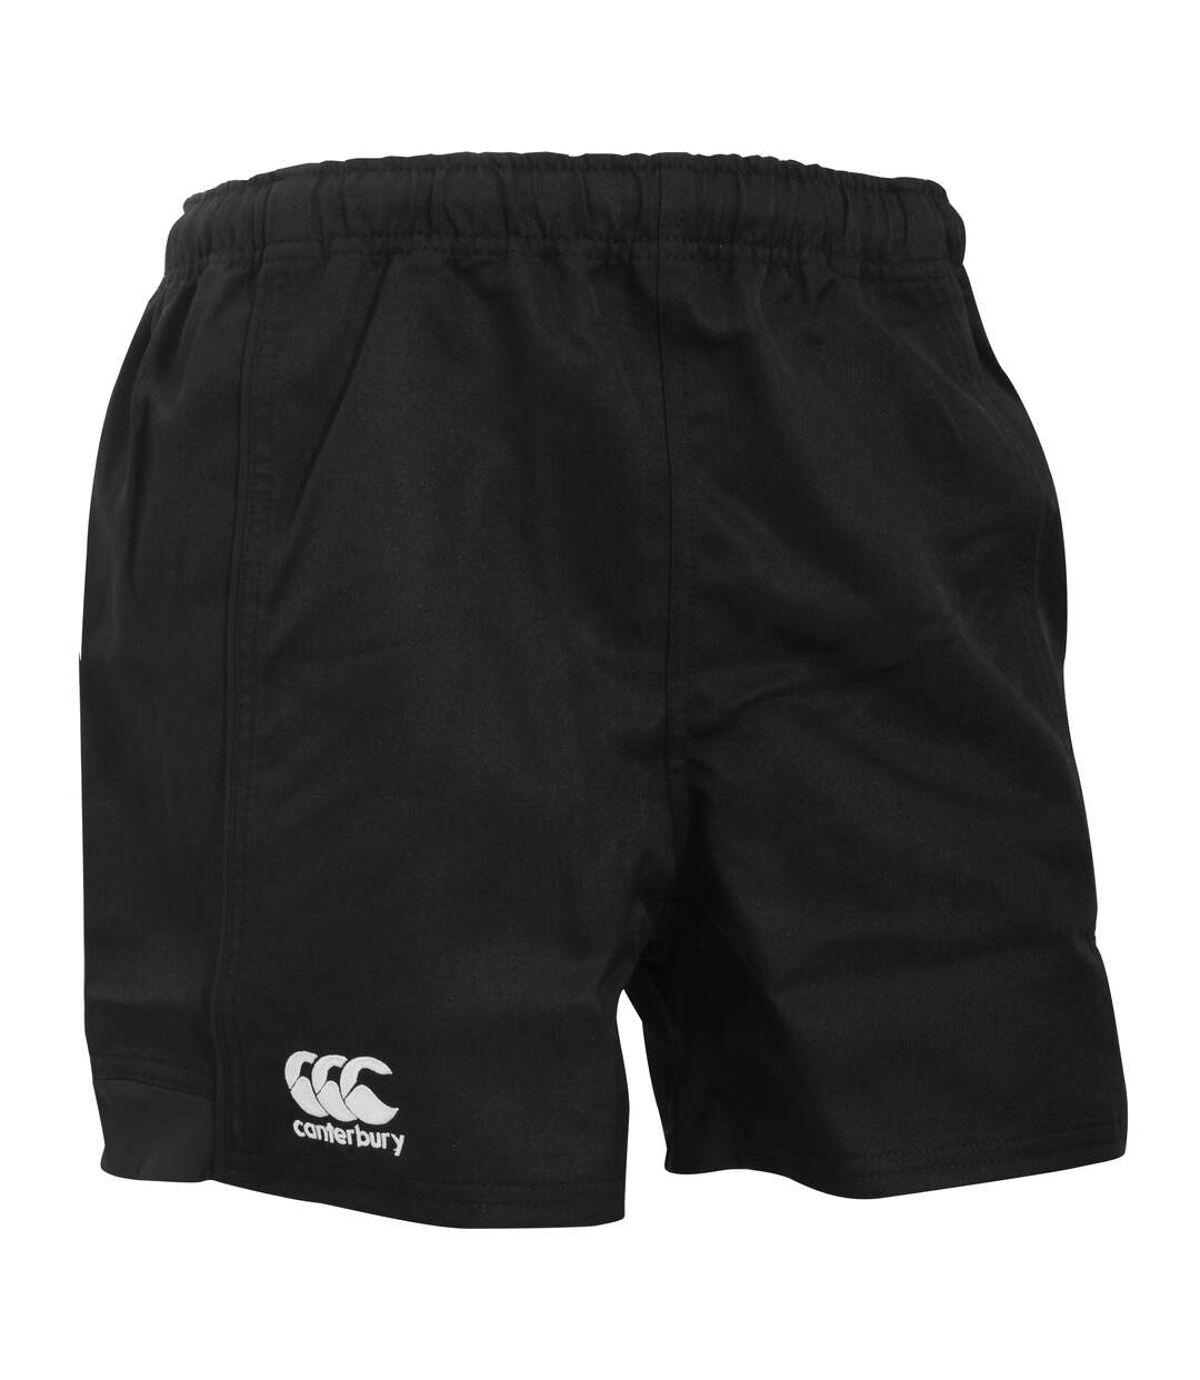 Canterbury Mens Advantage Elasticated Sports Shorts (Black) - UTPC2494